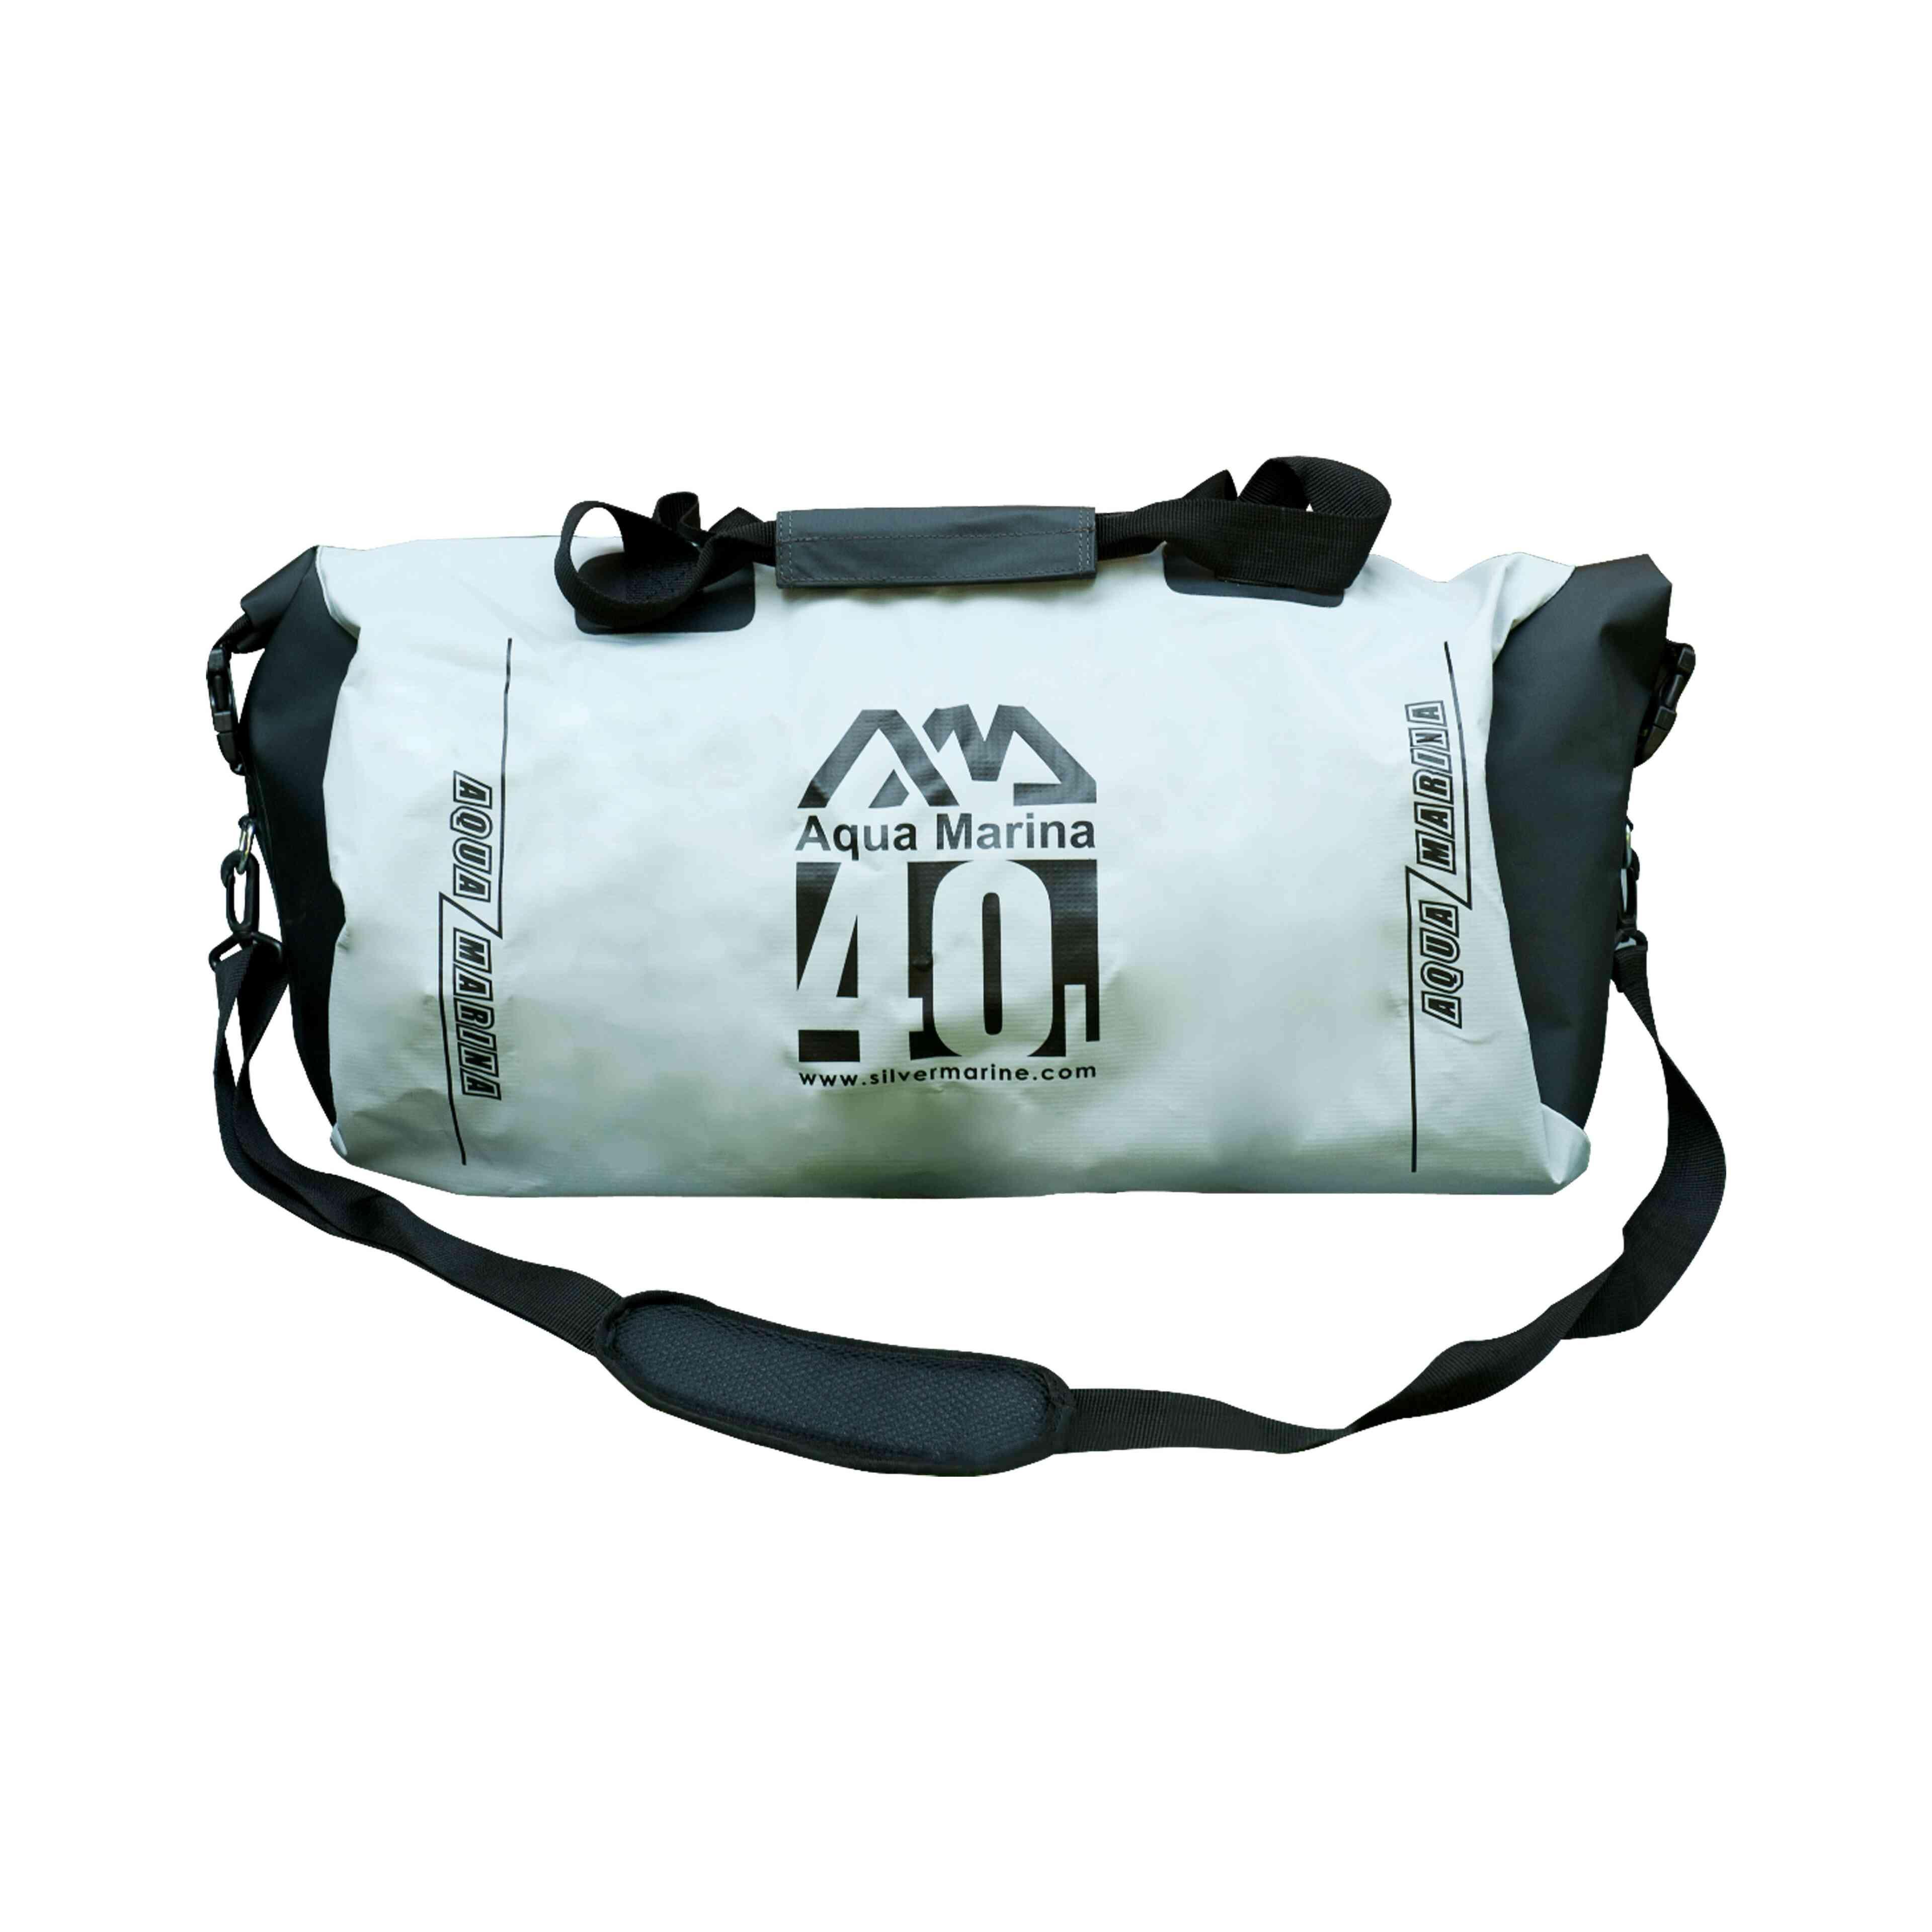 9ca9f521c39 Sac étanche marin 40L dry bag